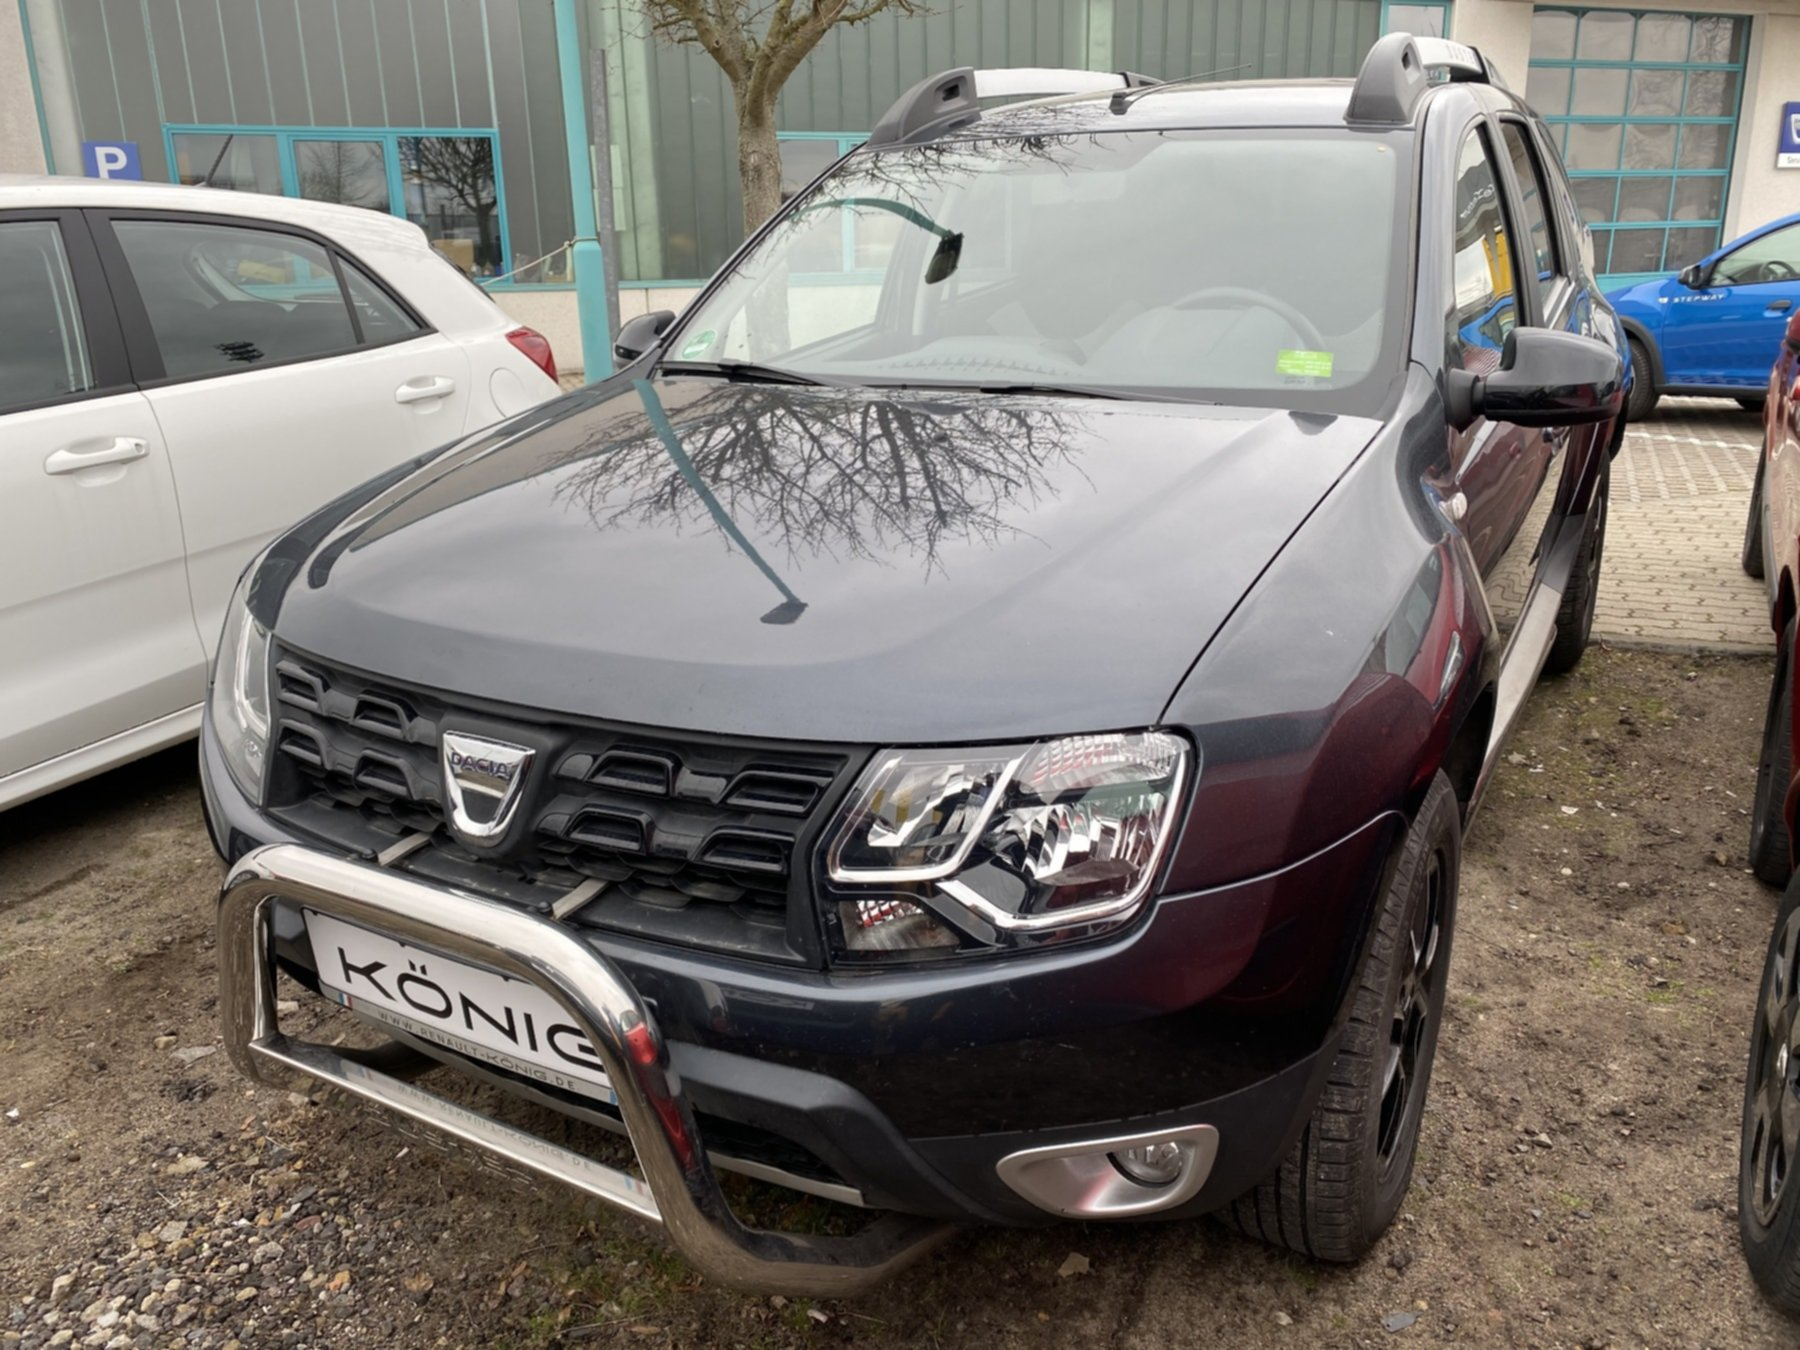 Dacia Duster 1.2 TCe 125 BLACKSCHADOW 4x4 Klimaanlage, Jahr 2018, Benzin